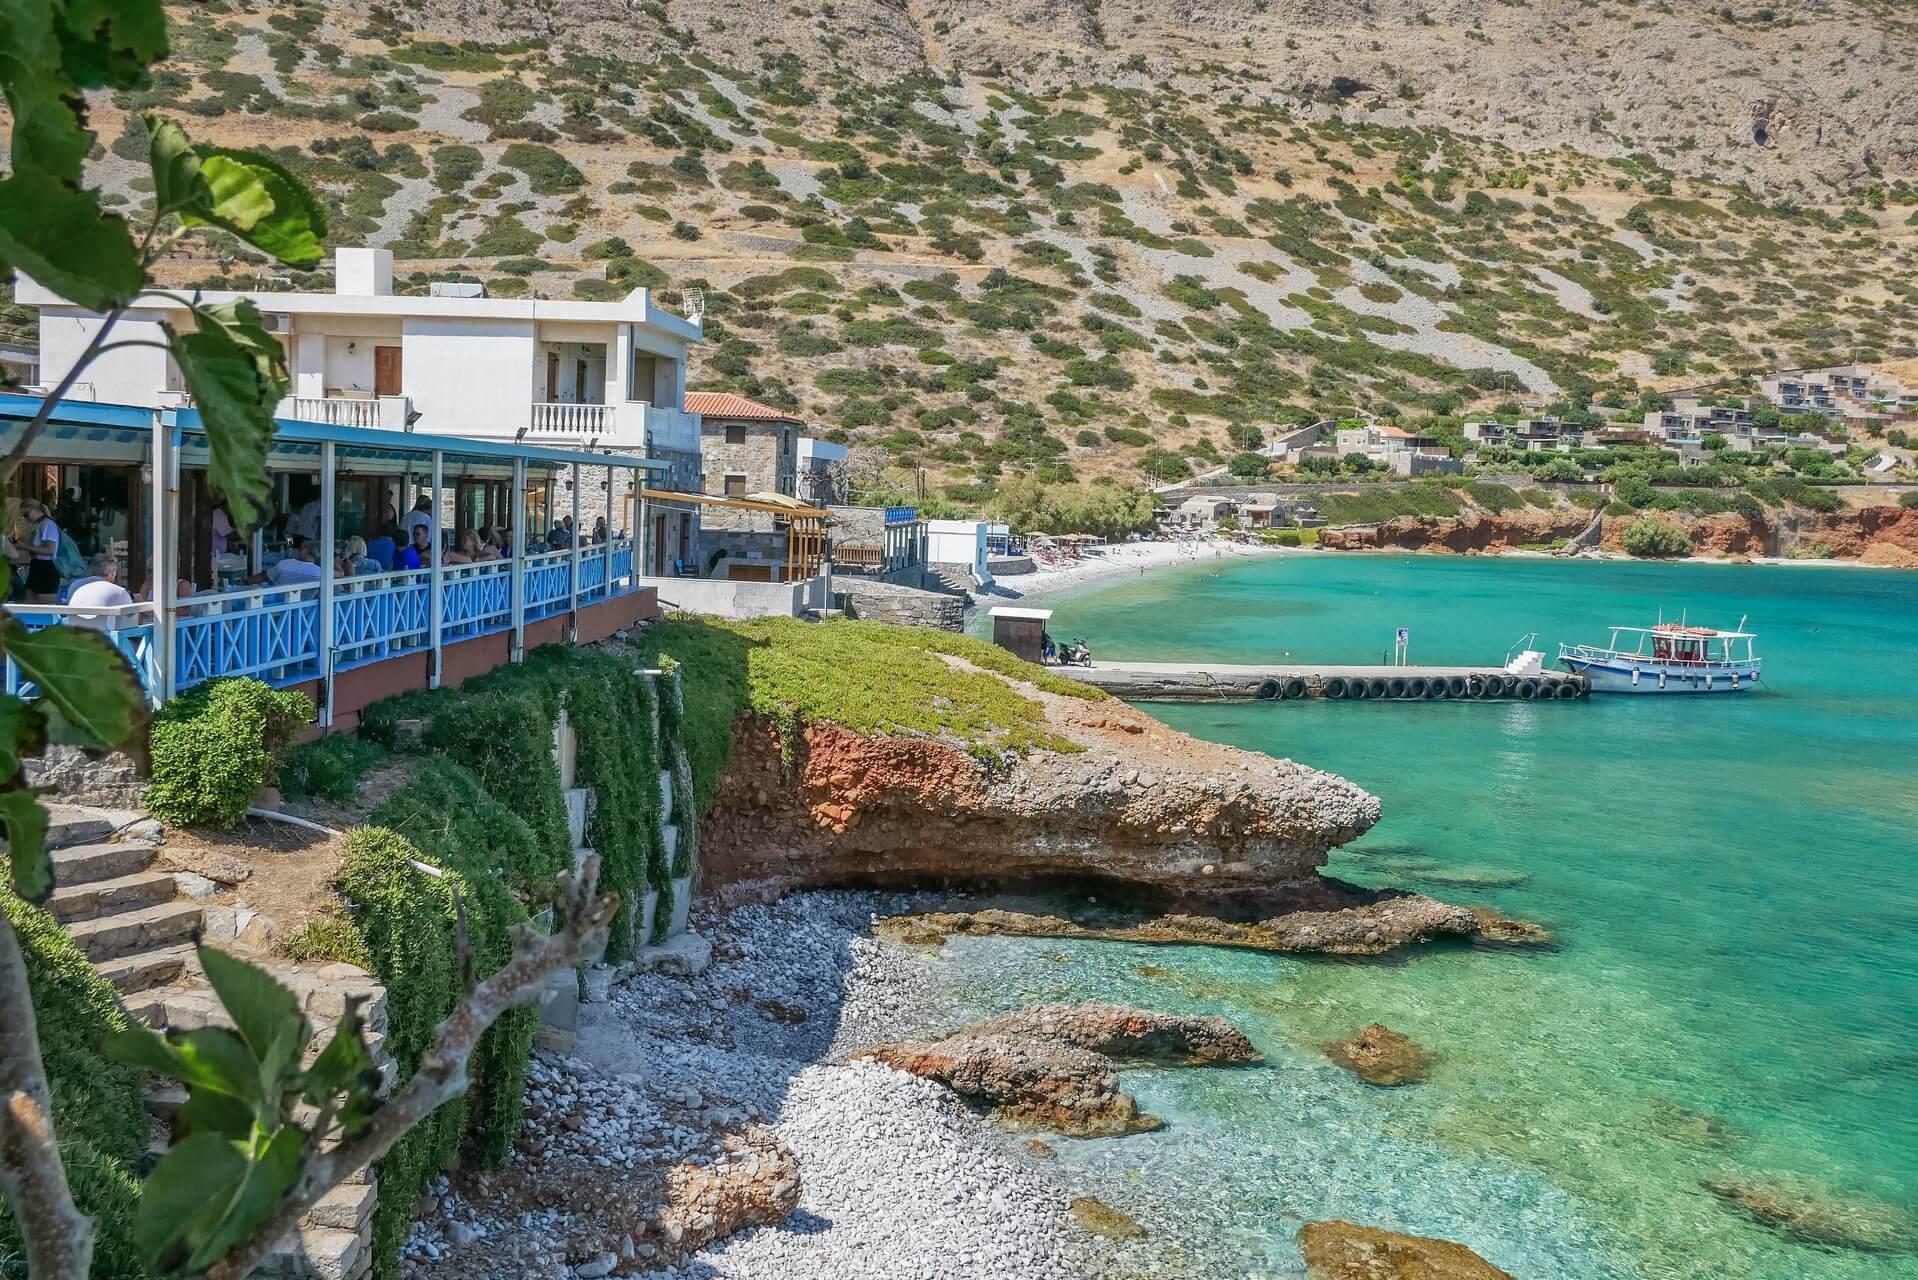 Plaka in Agios Nikolaos Lasithi Crete - Copyright Allincrete.com